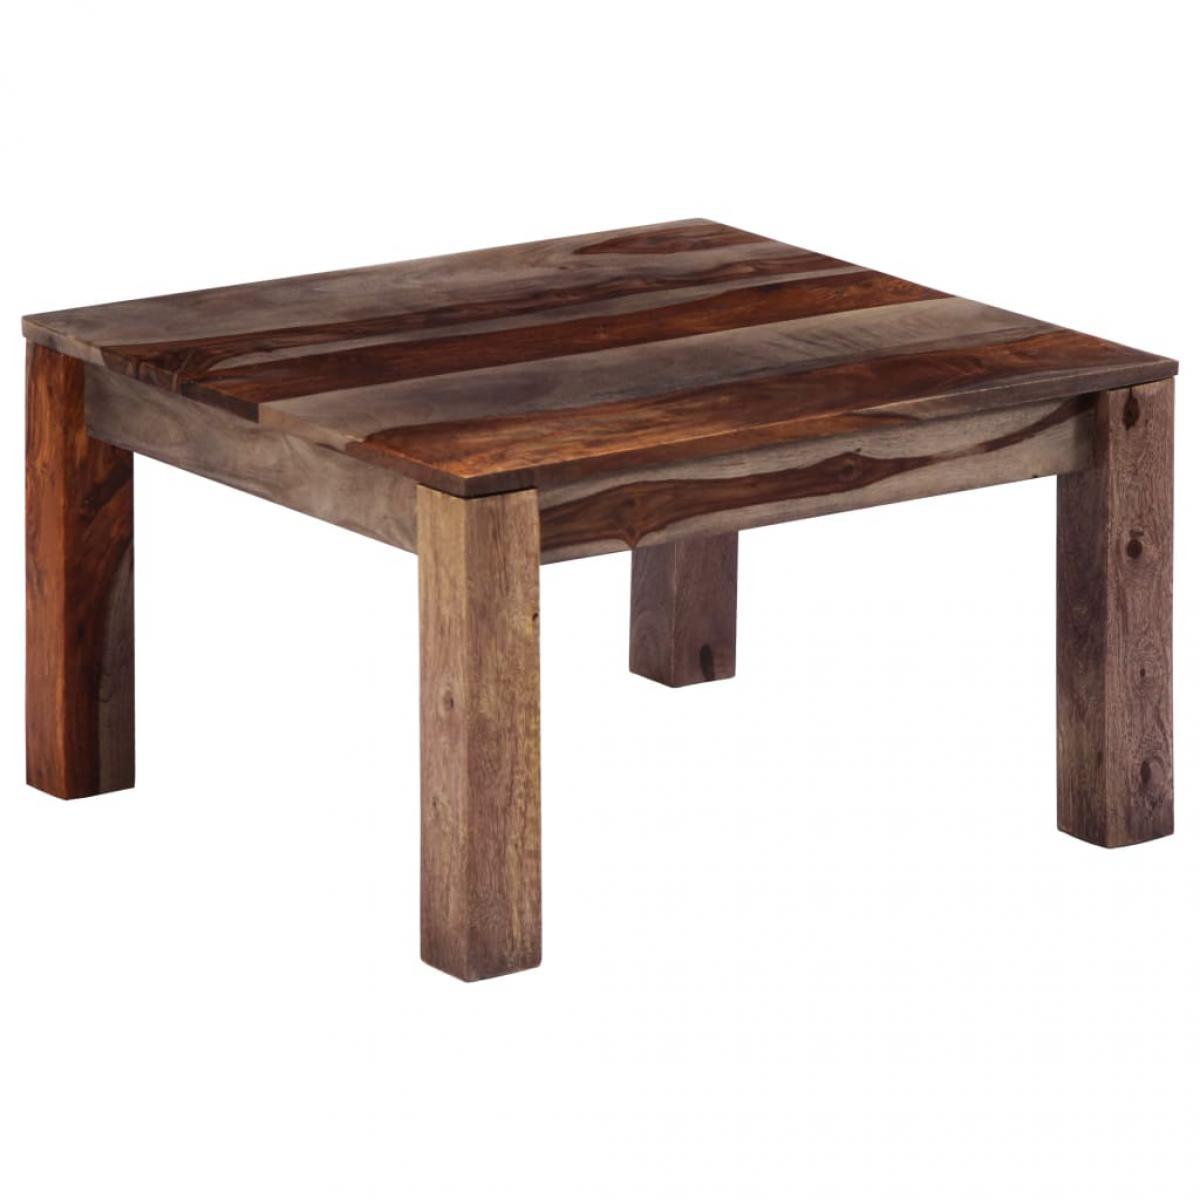 Chunhelife Table basse Gris 60 x 60 x 35 cm Bois de Sesham massif